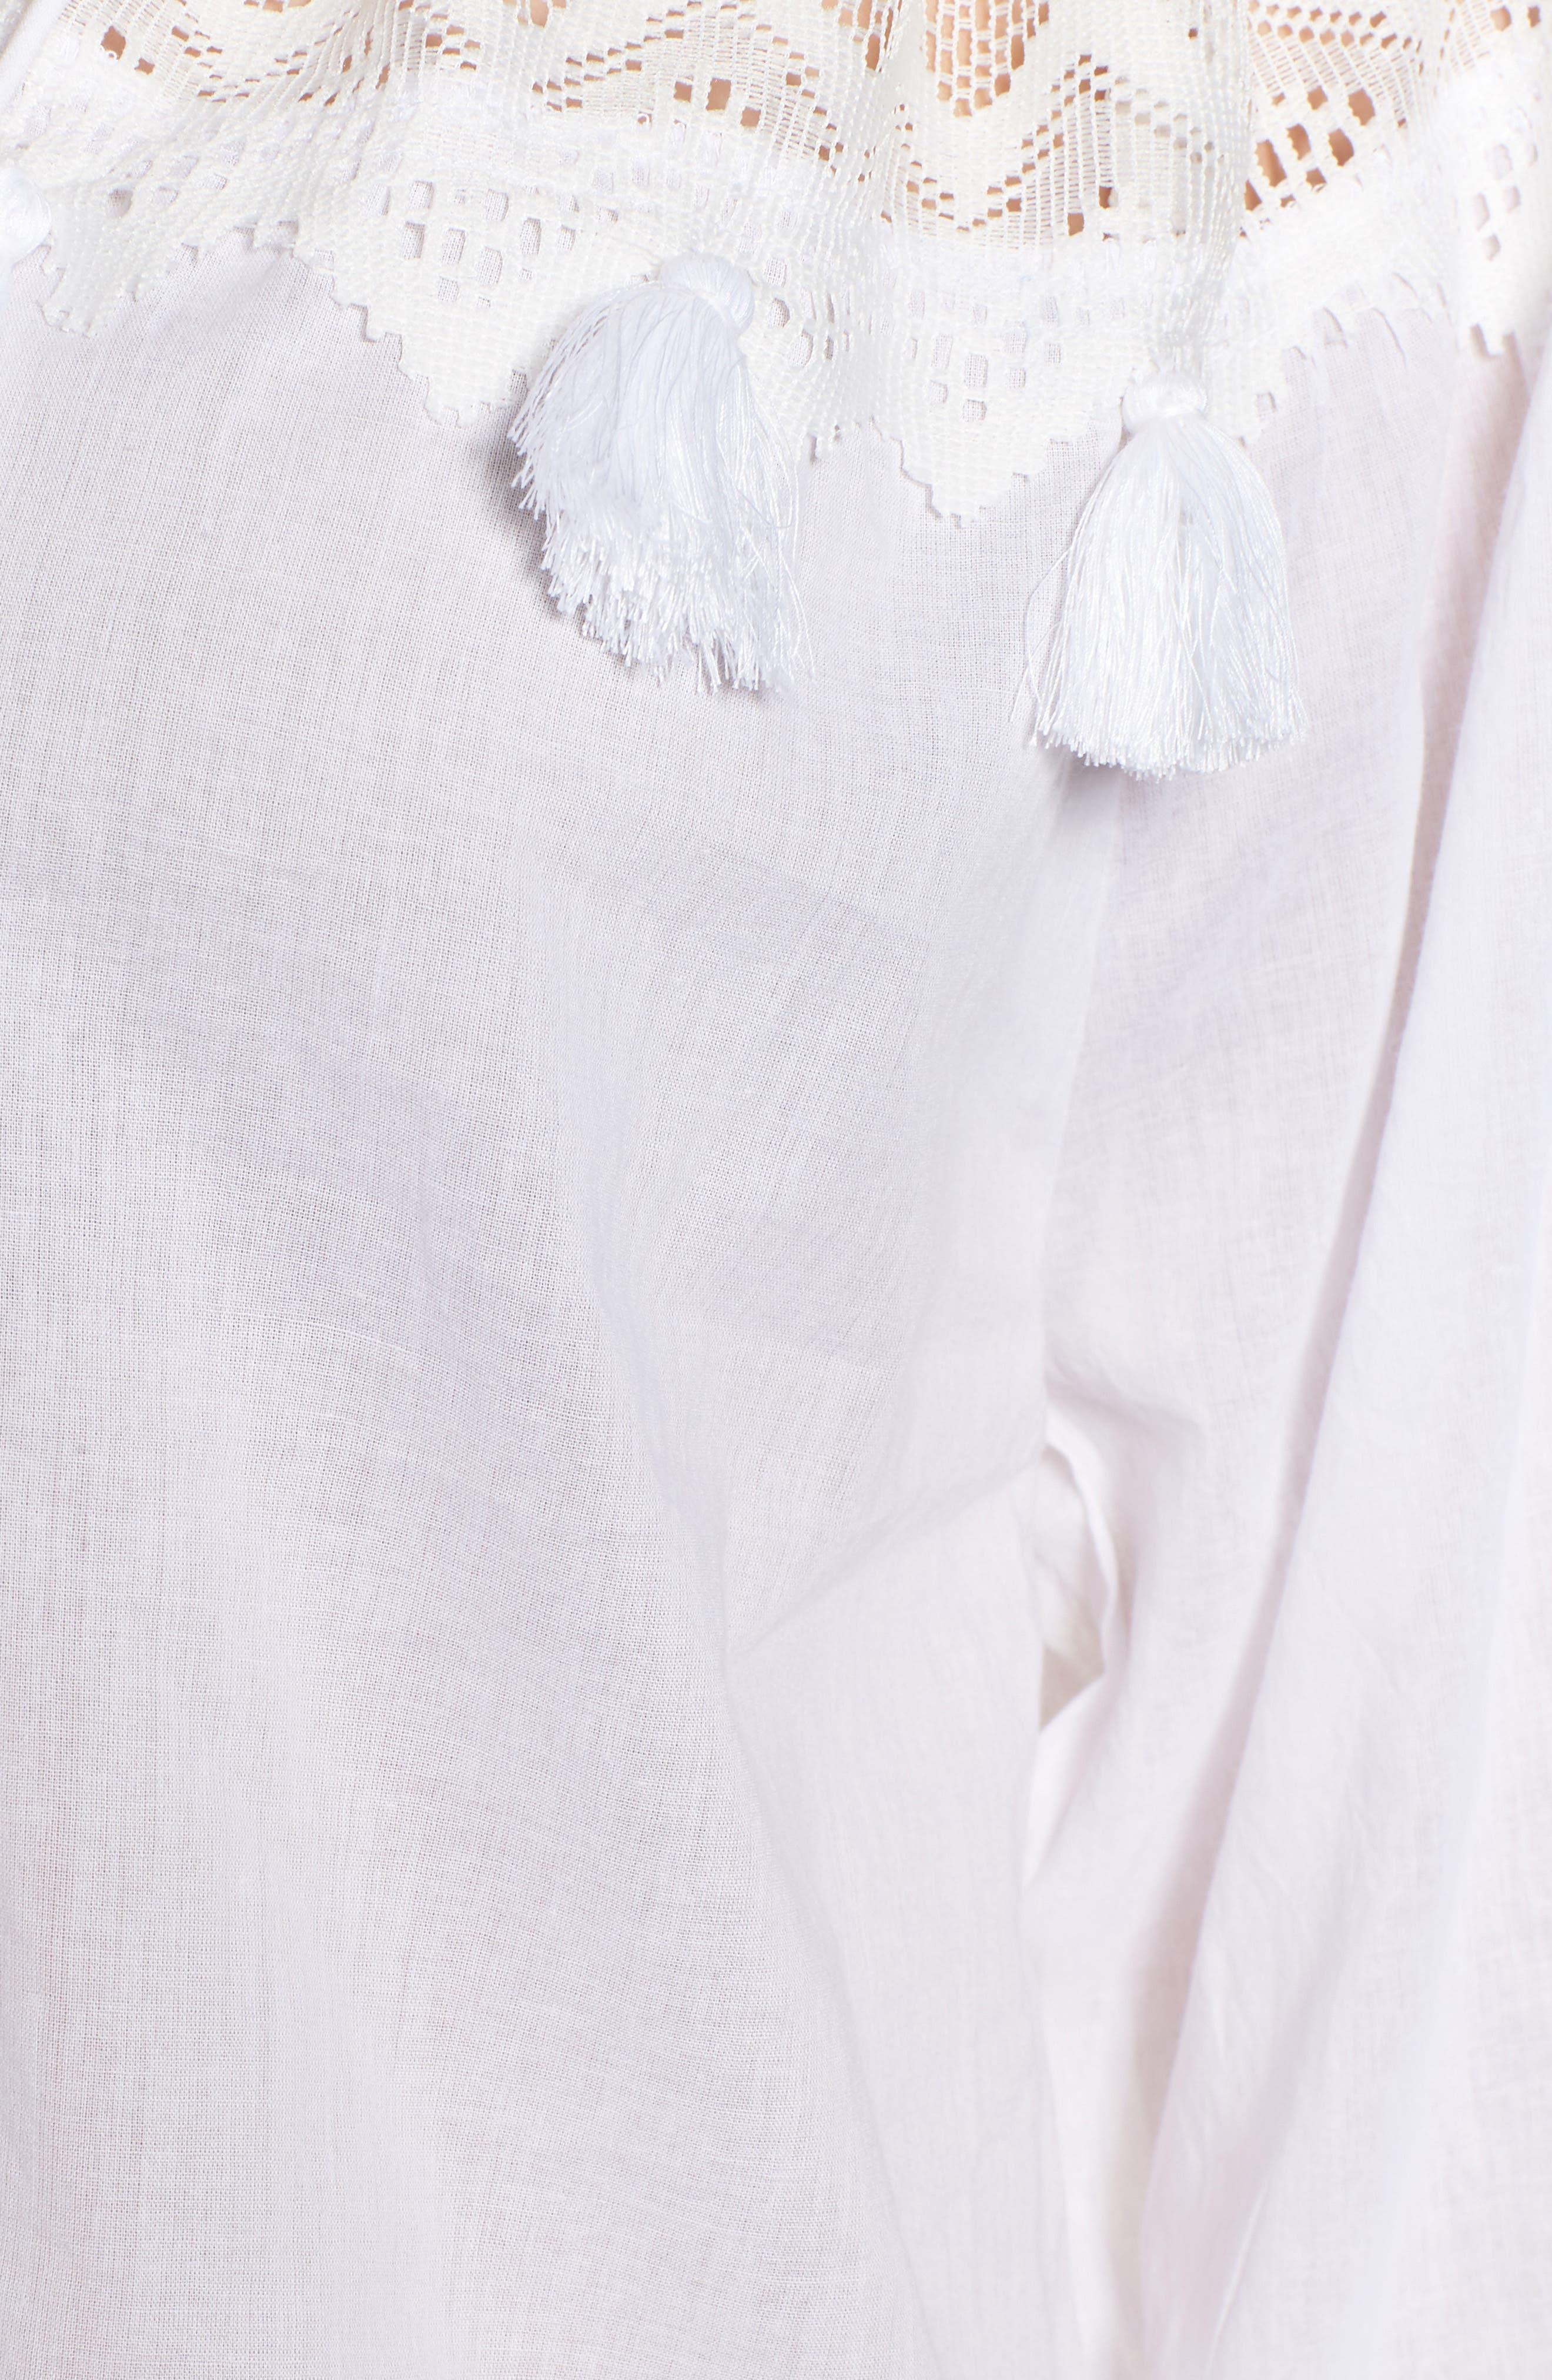 Berkley White Lace Cotton Blend Top,                             Alternate thumbnail 6, color,                             WHITE